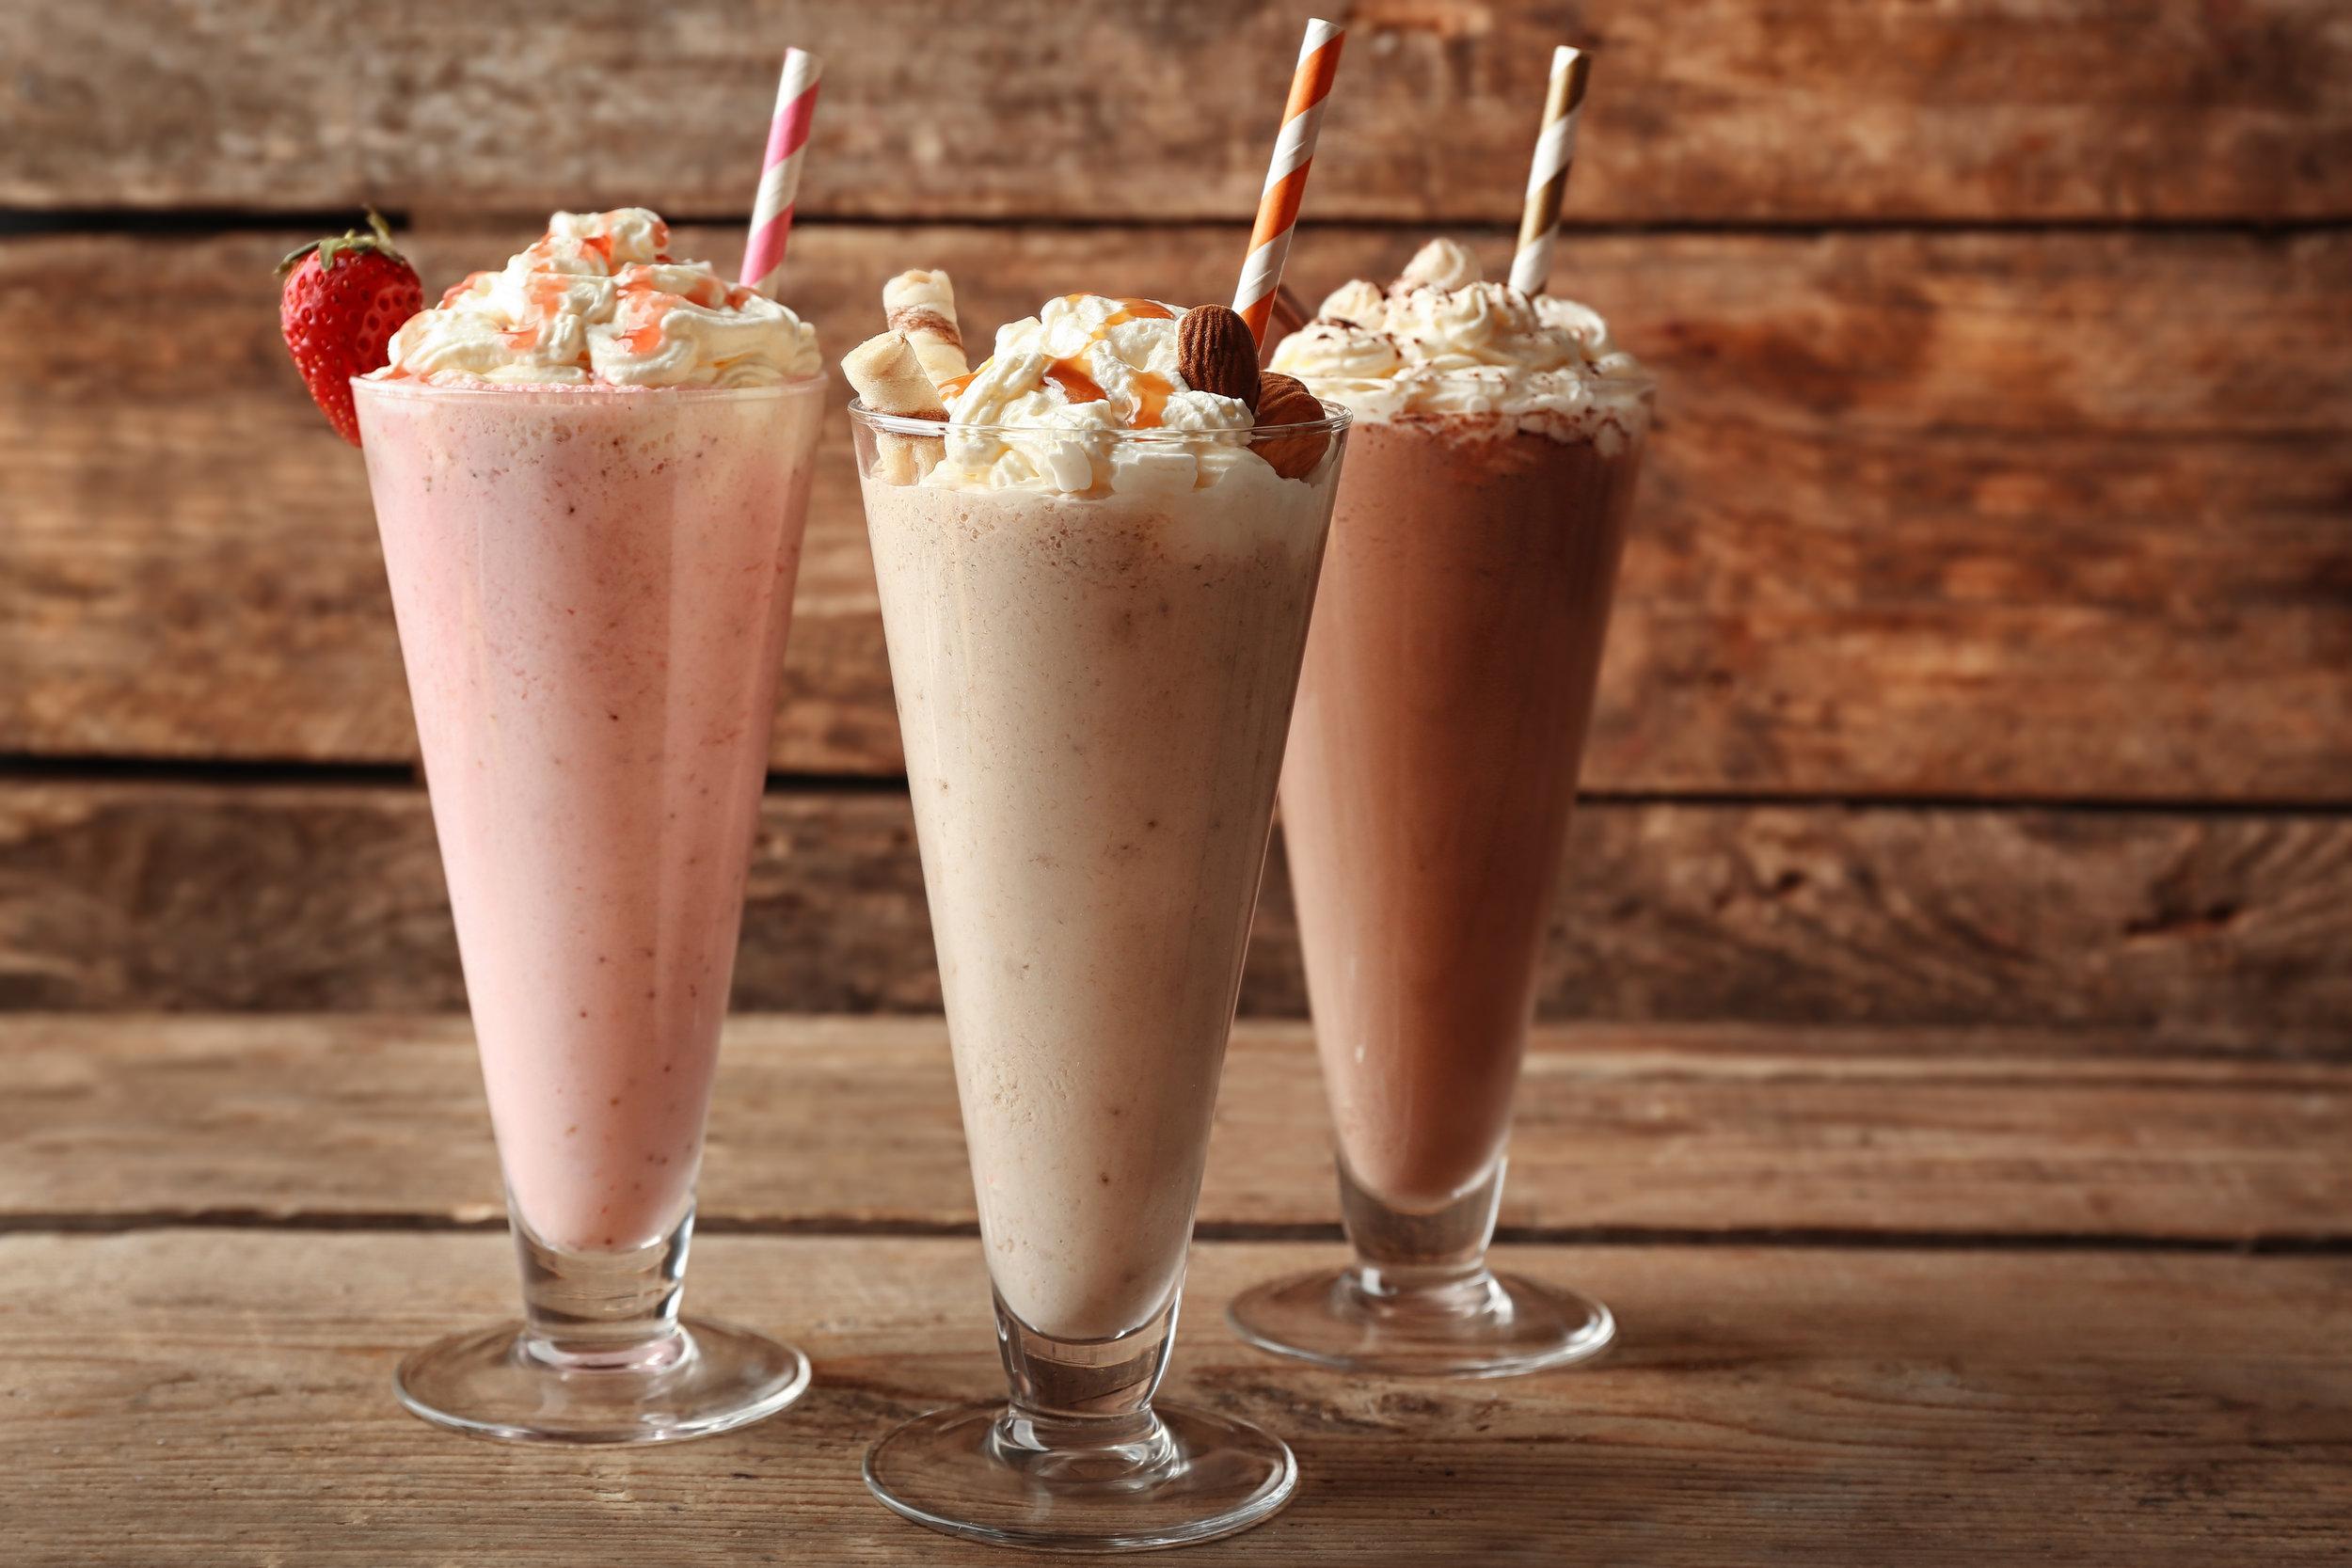 Feeling Thirsty - Enjoy our delicious milkshake